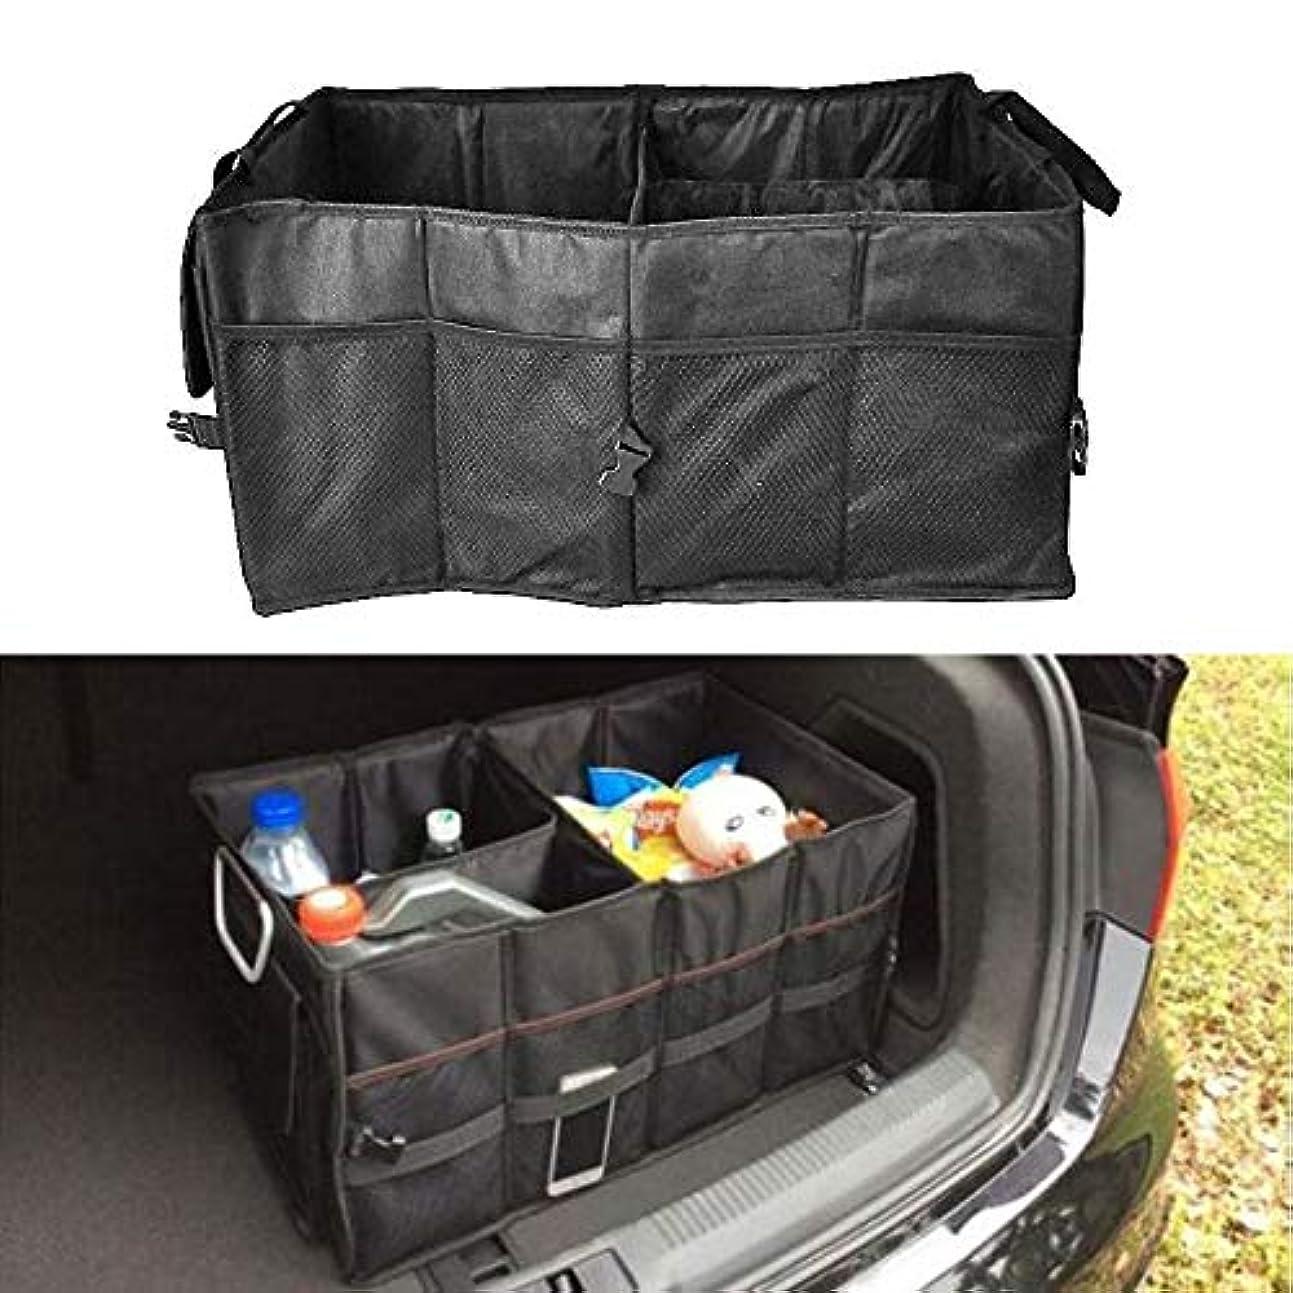 電子引用破壊的Jicorzo - Multi-purpose Car Trunk SUV Cargo Organizer Foldable Storage Box Bag Tool Case